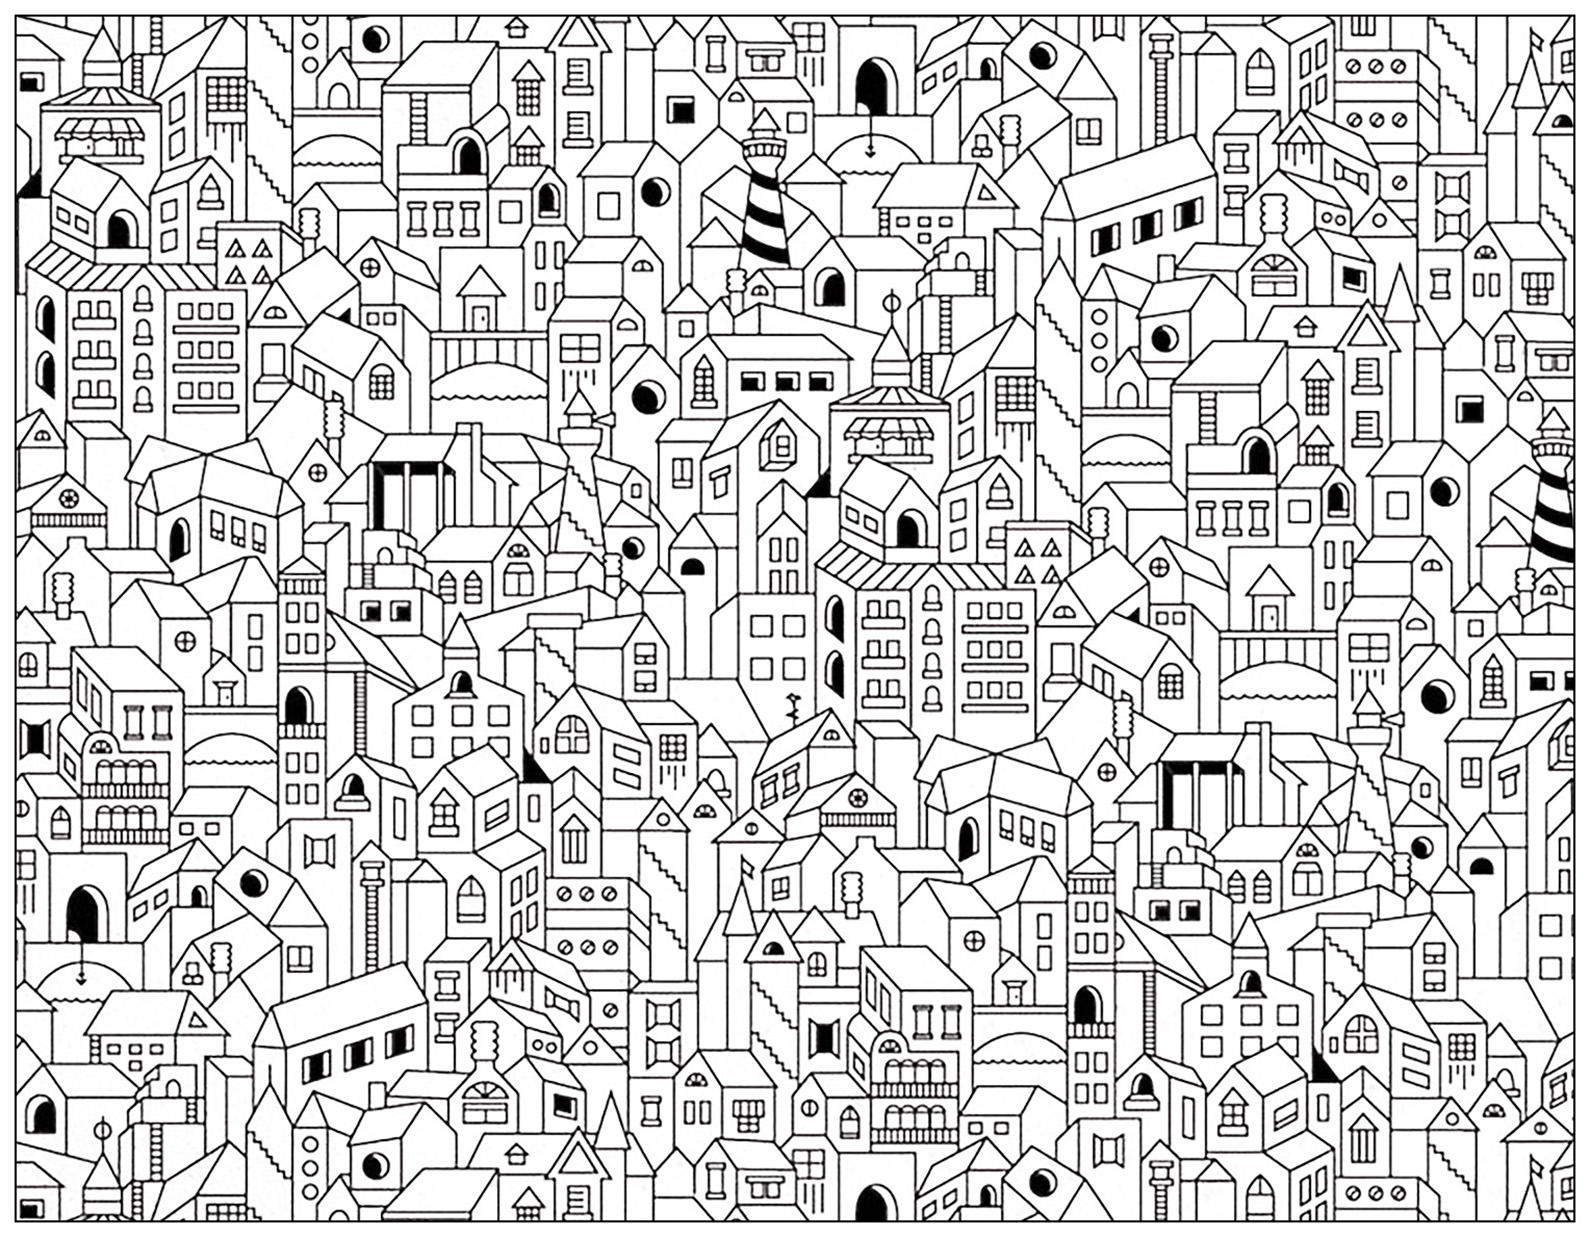 Disegni da colorare per adulti : Doodle art / Doodling - 39